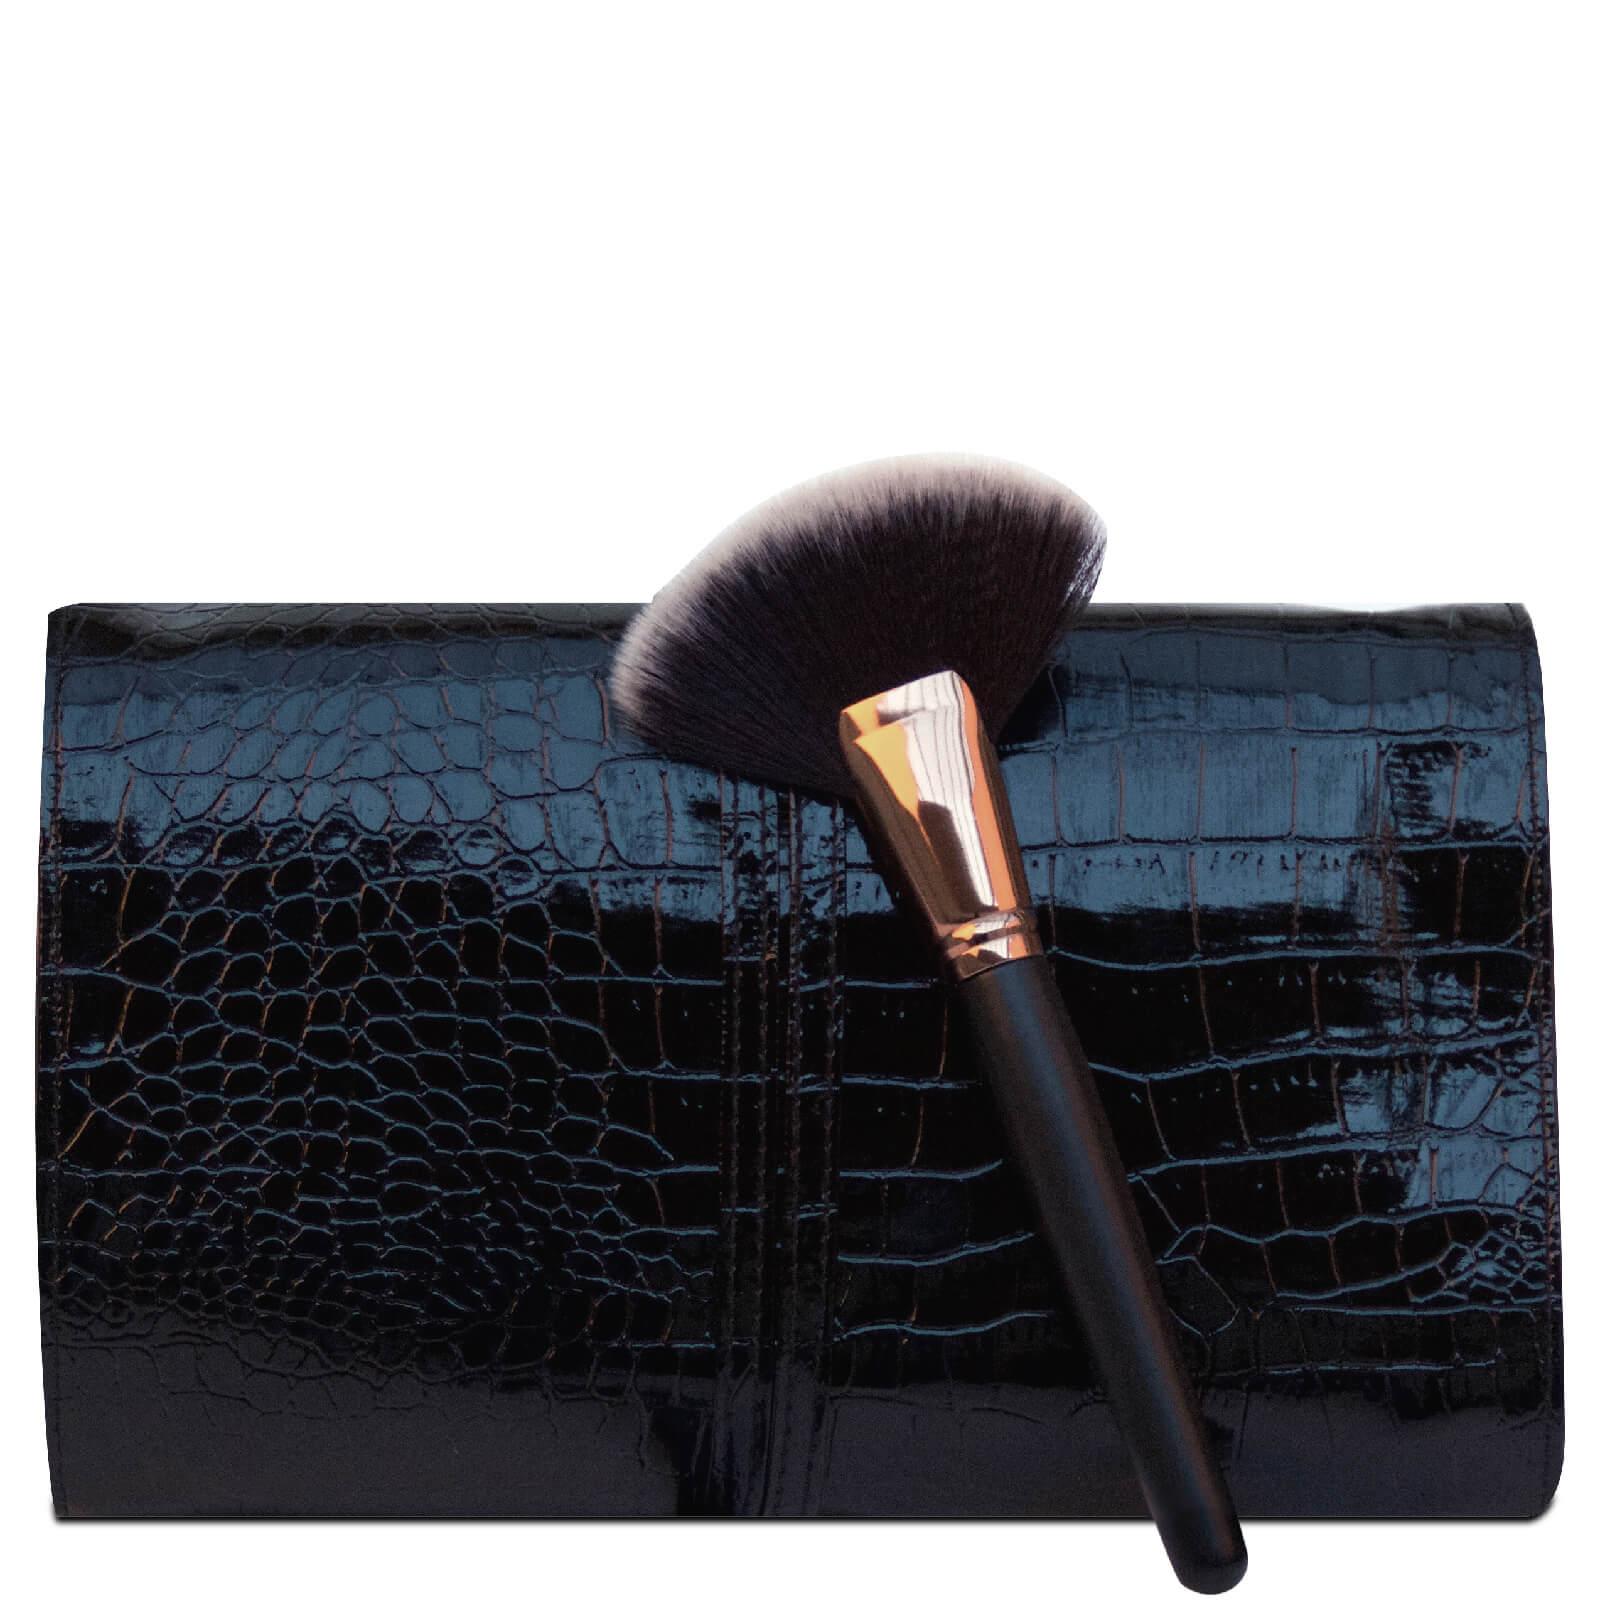 c2f5123dc640 Rio 24 Piece Professional Cosmetic Make Up Brush Set